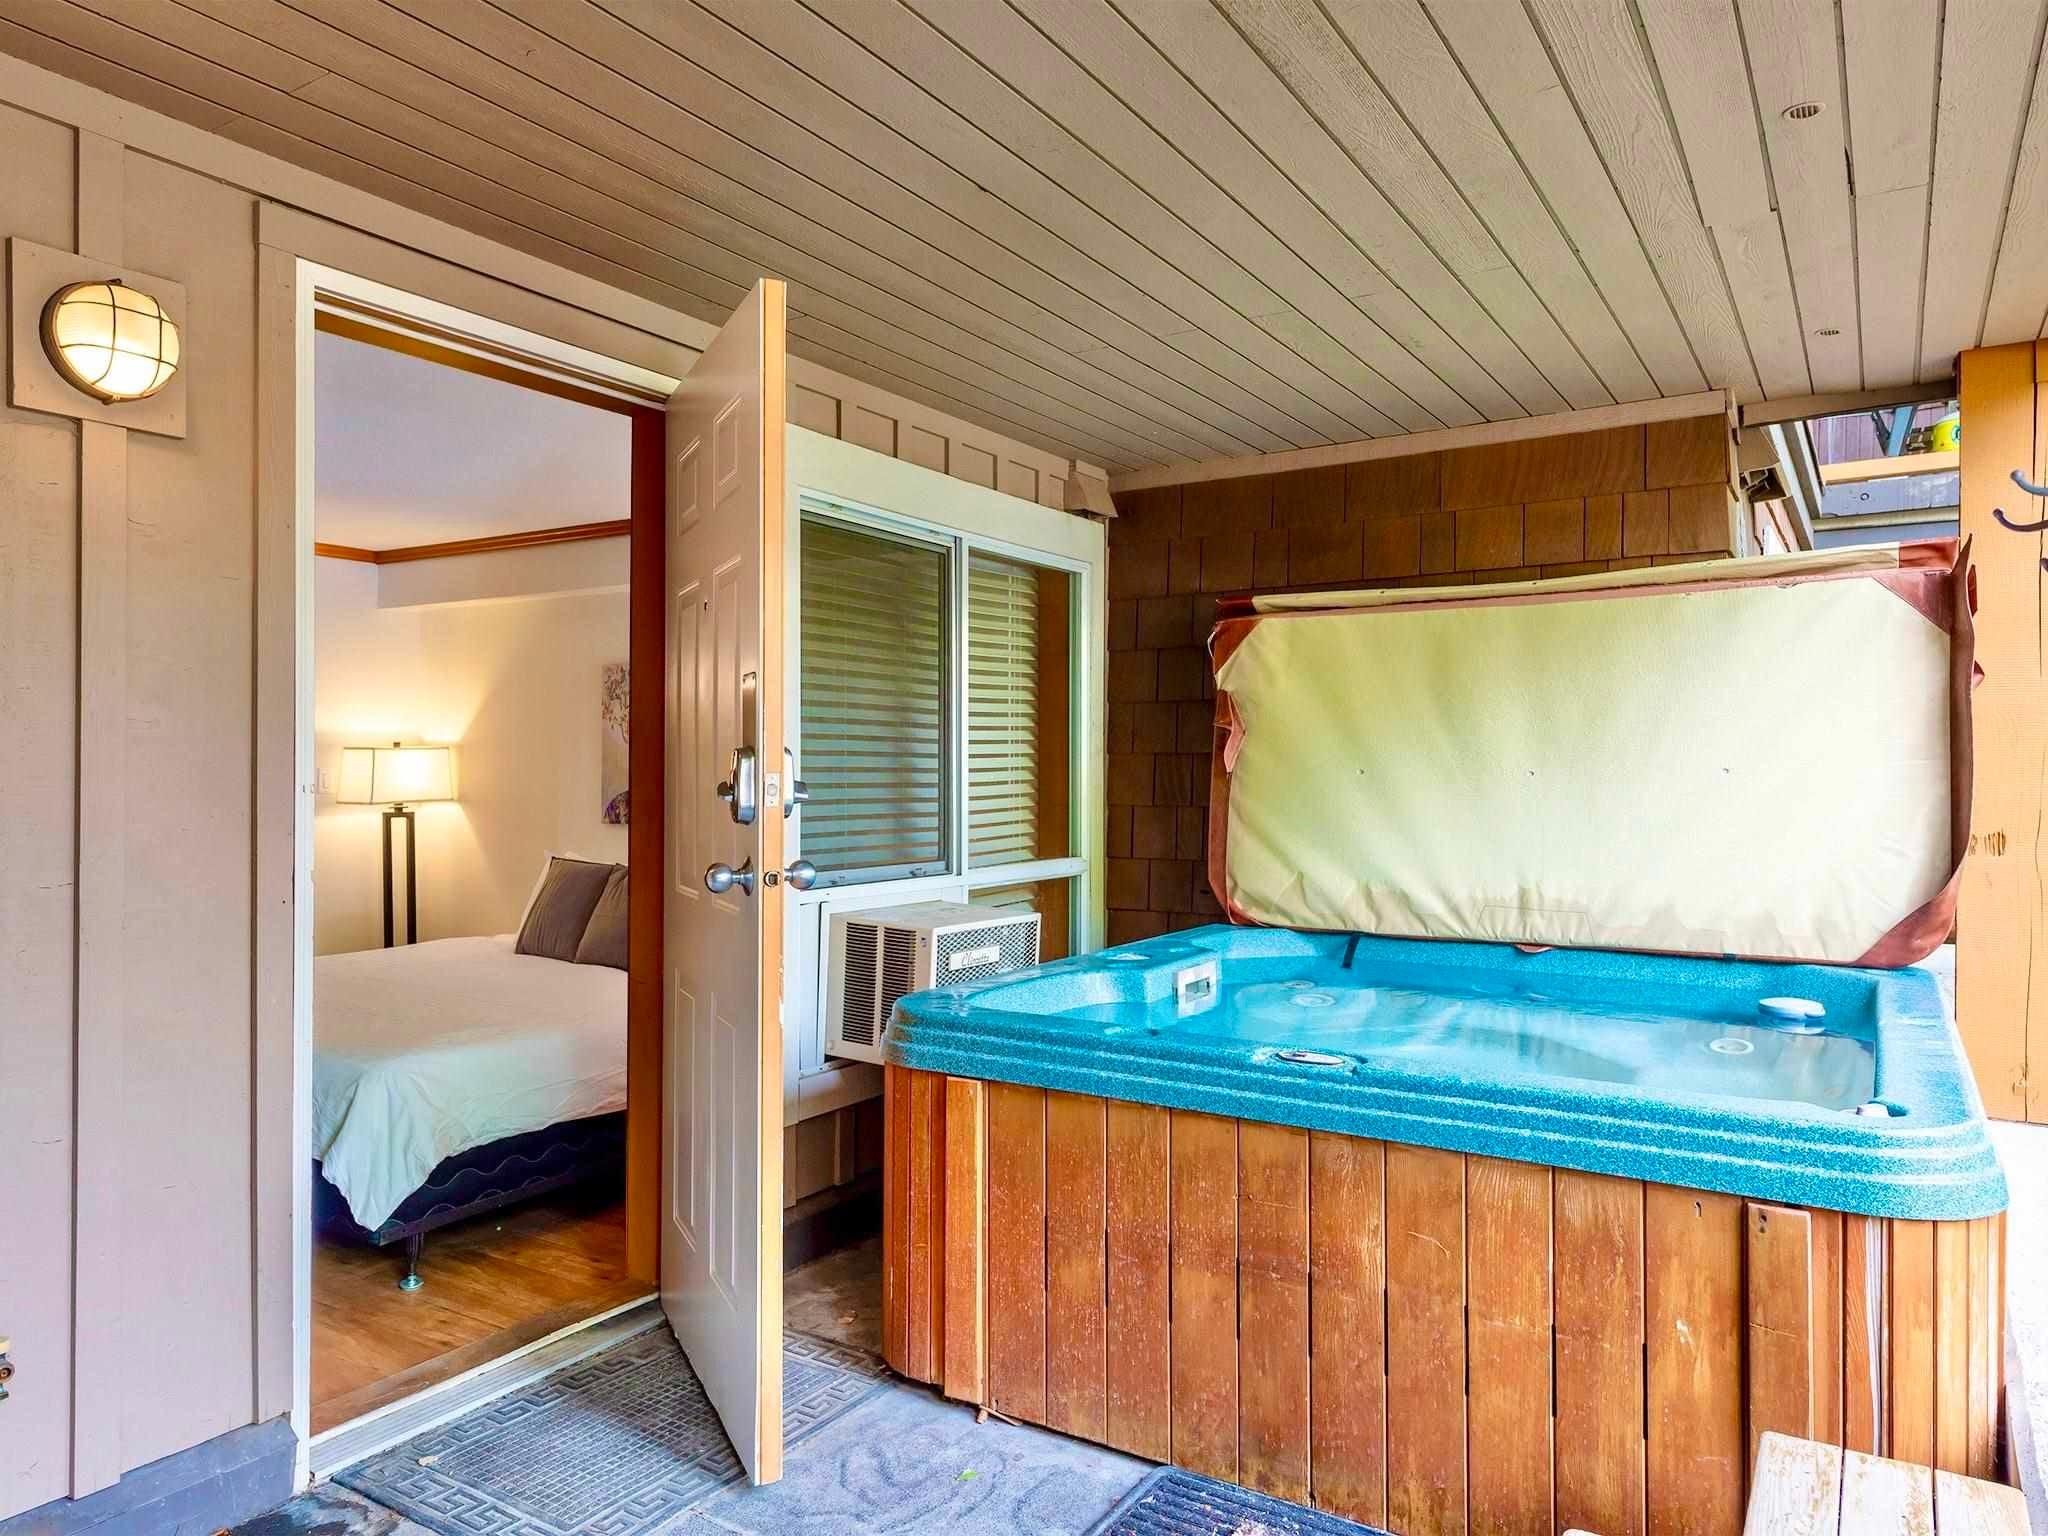 73 4388 NORTHLANDS BOULEVARD - Whistler Village Townhouse for sale, 2 Bedrooms (R2580863) - #13